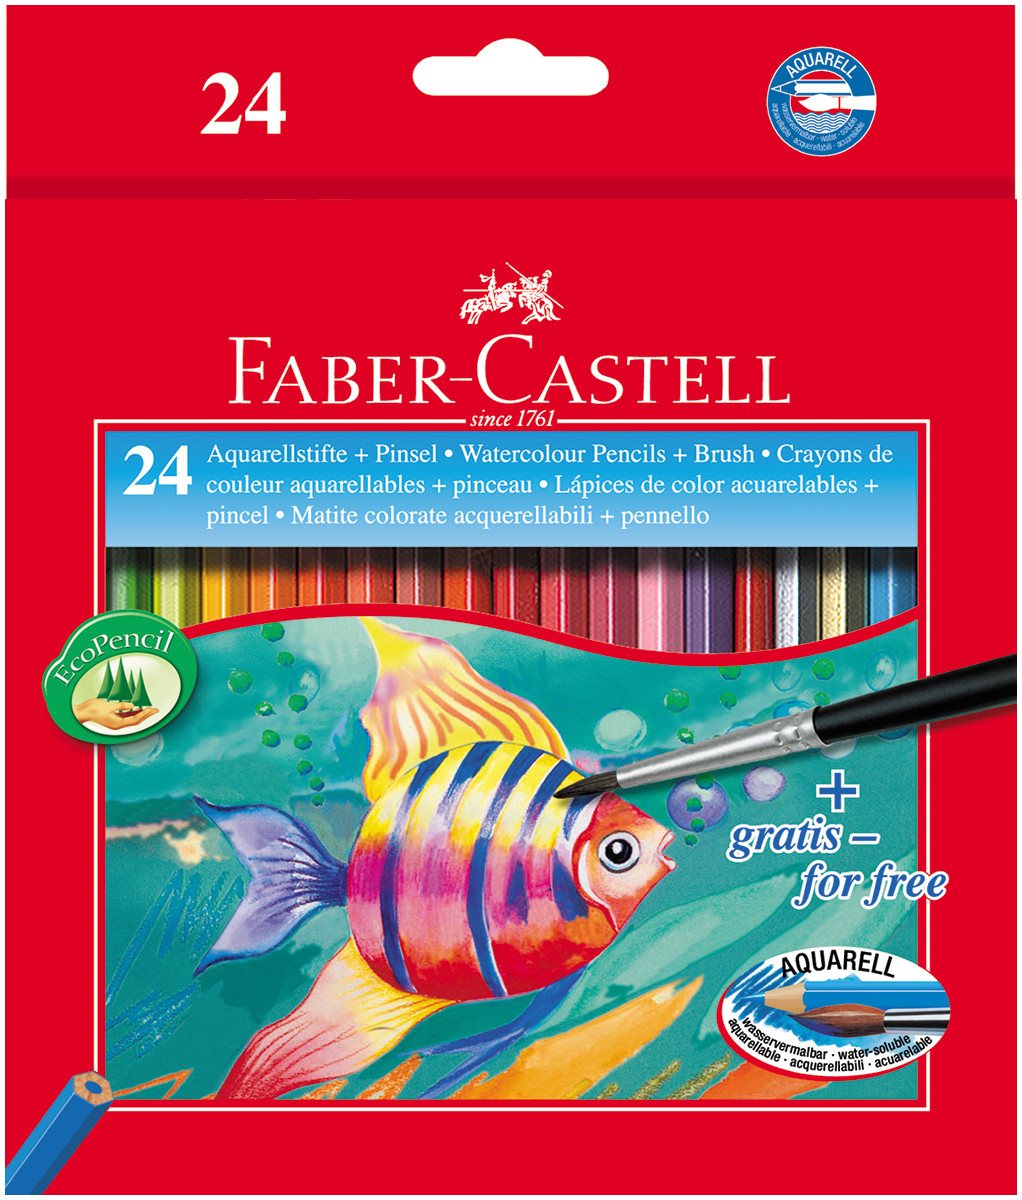 Faber-Castell Aquarelle Watercolour Pencils - Assorted Colours (Pack of 24)